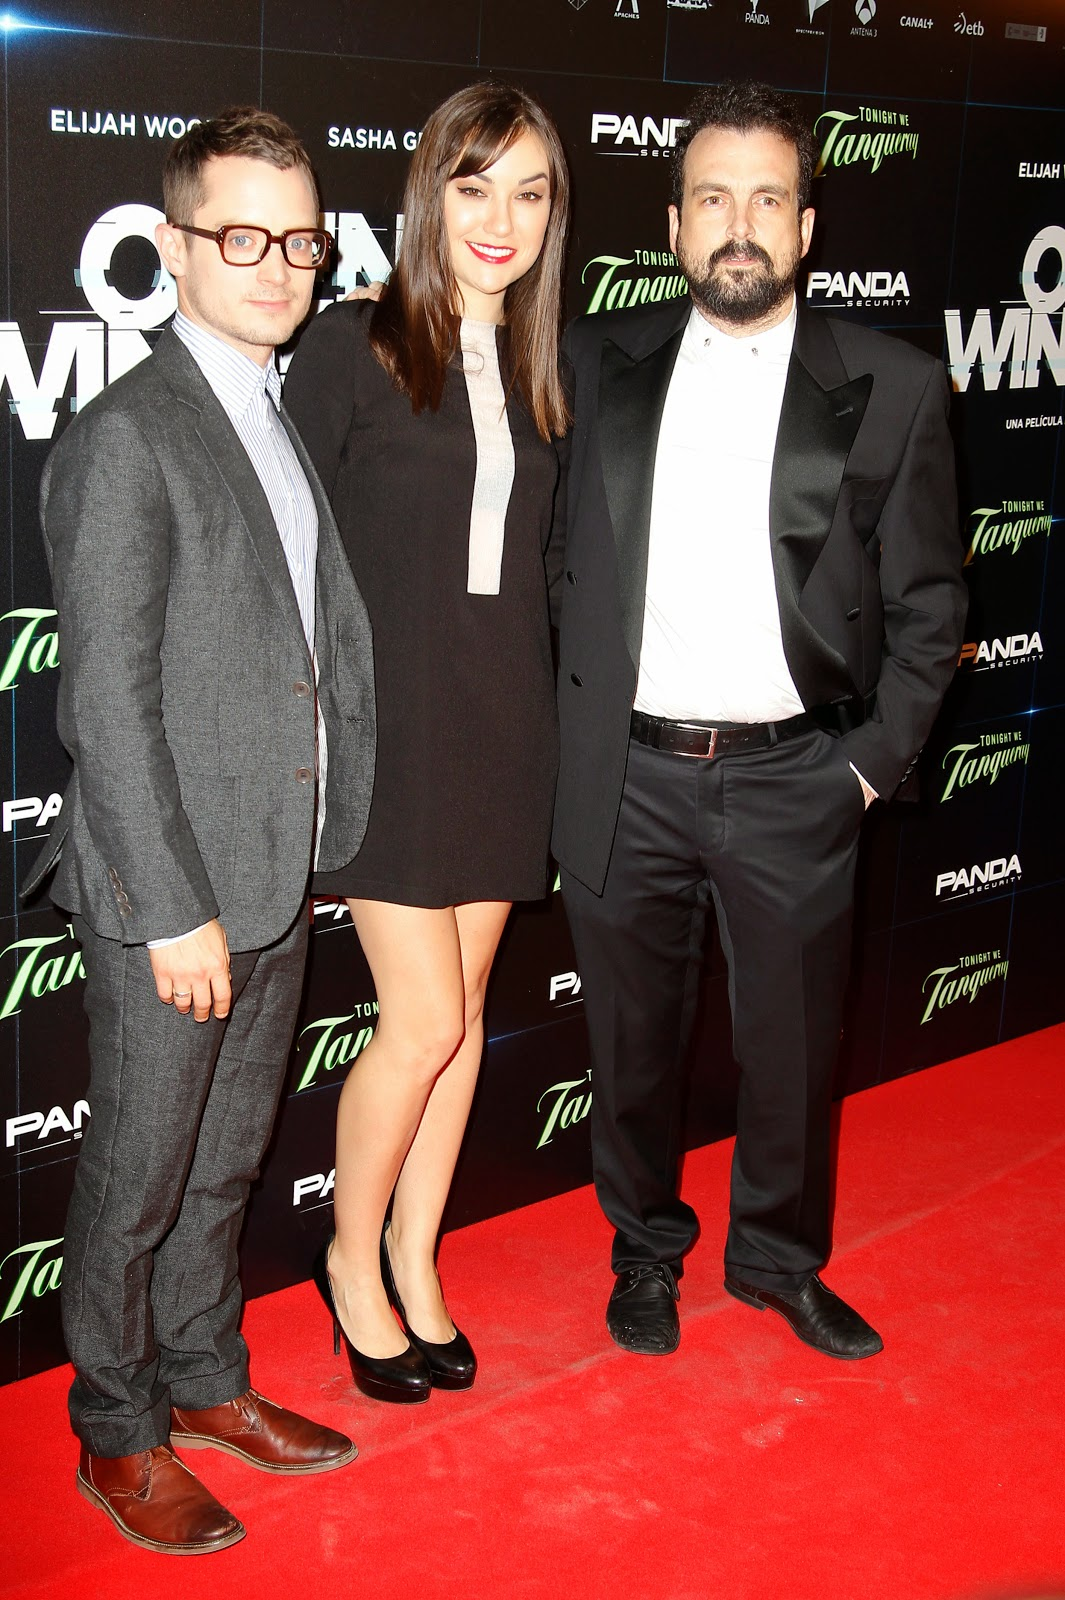 Sasha Grey HD Pictures | HD Wallpapers of Sasha Grey